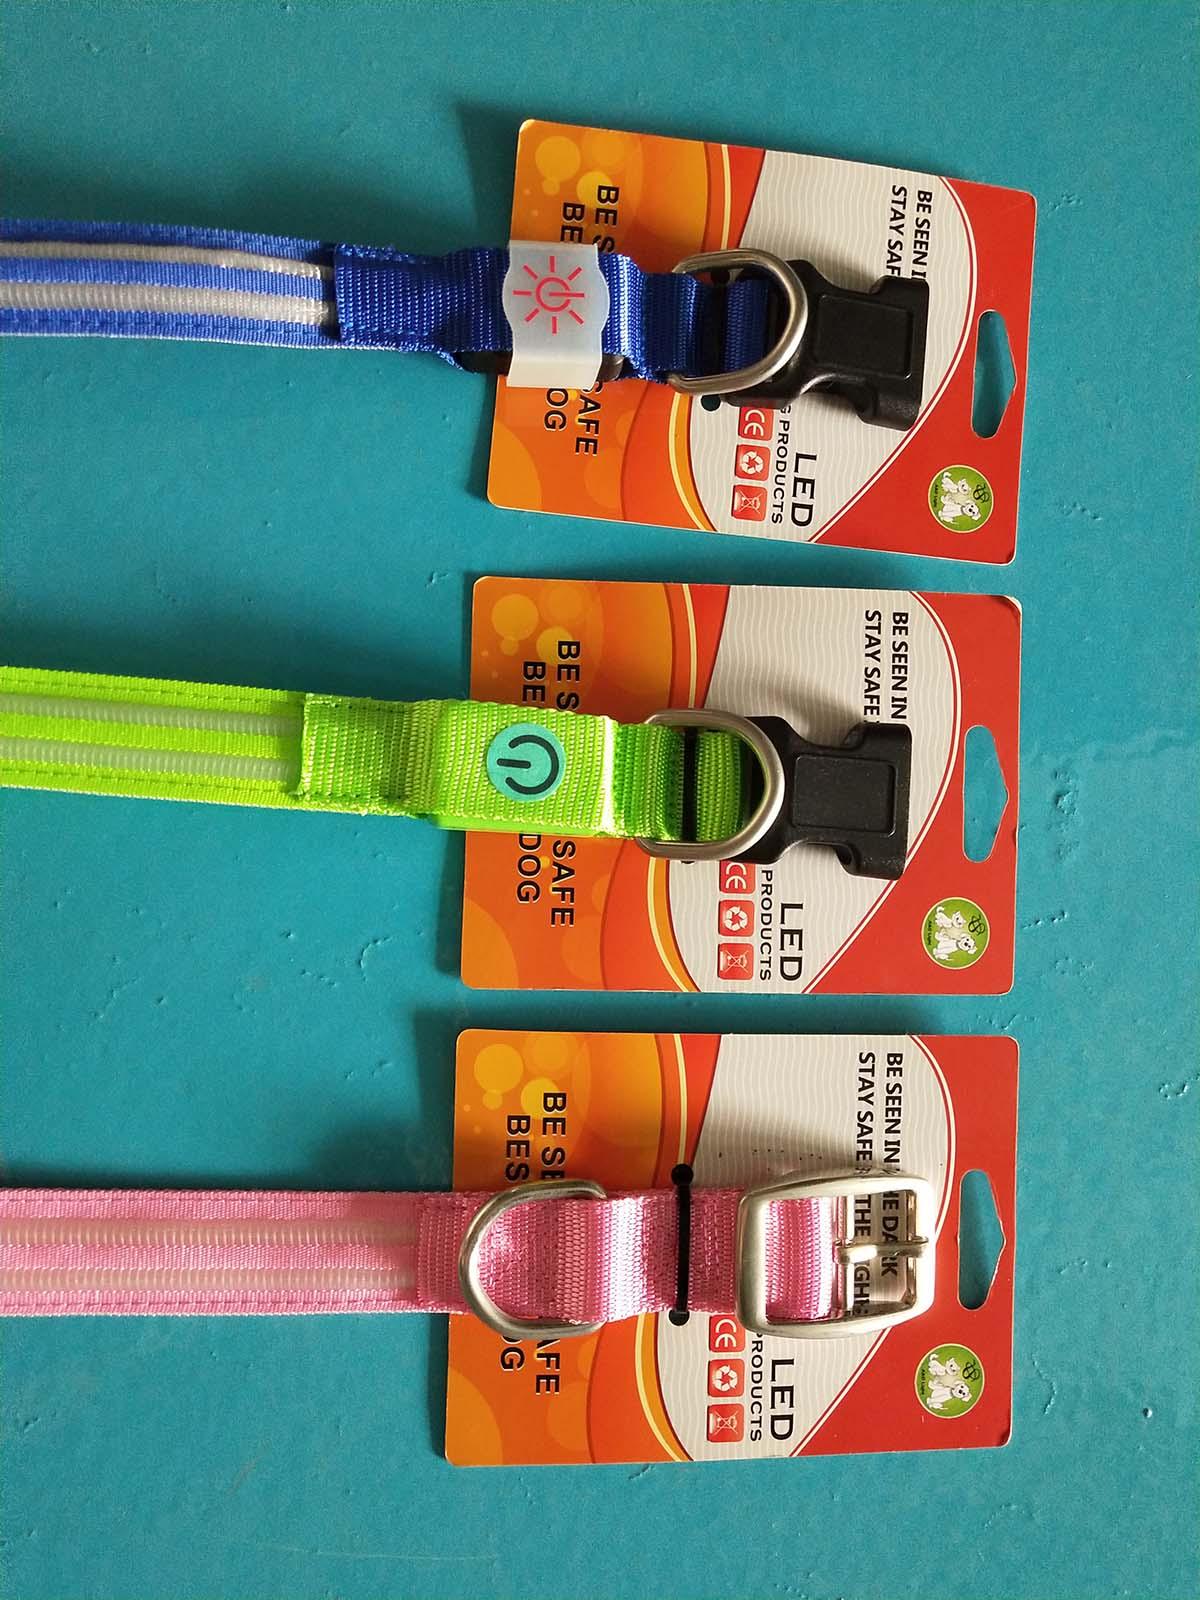 AIDI-High-quality Flashing Dog Collar | Aidi-c16 Custom Super Bright-8